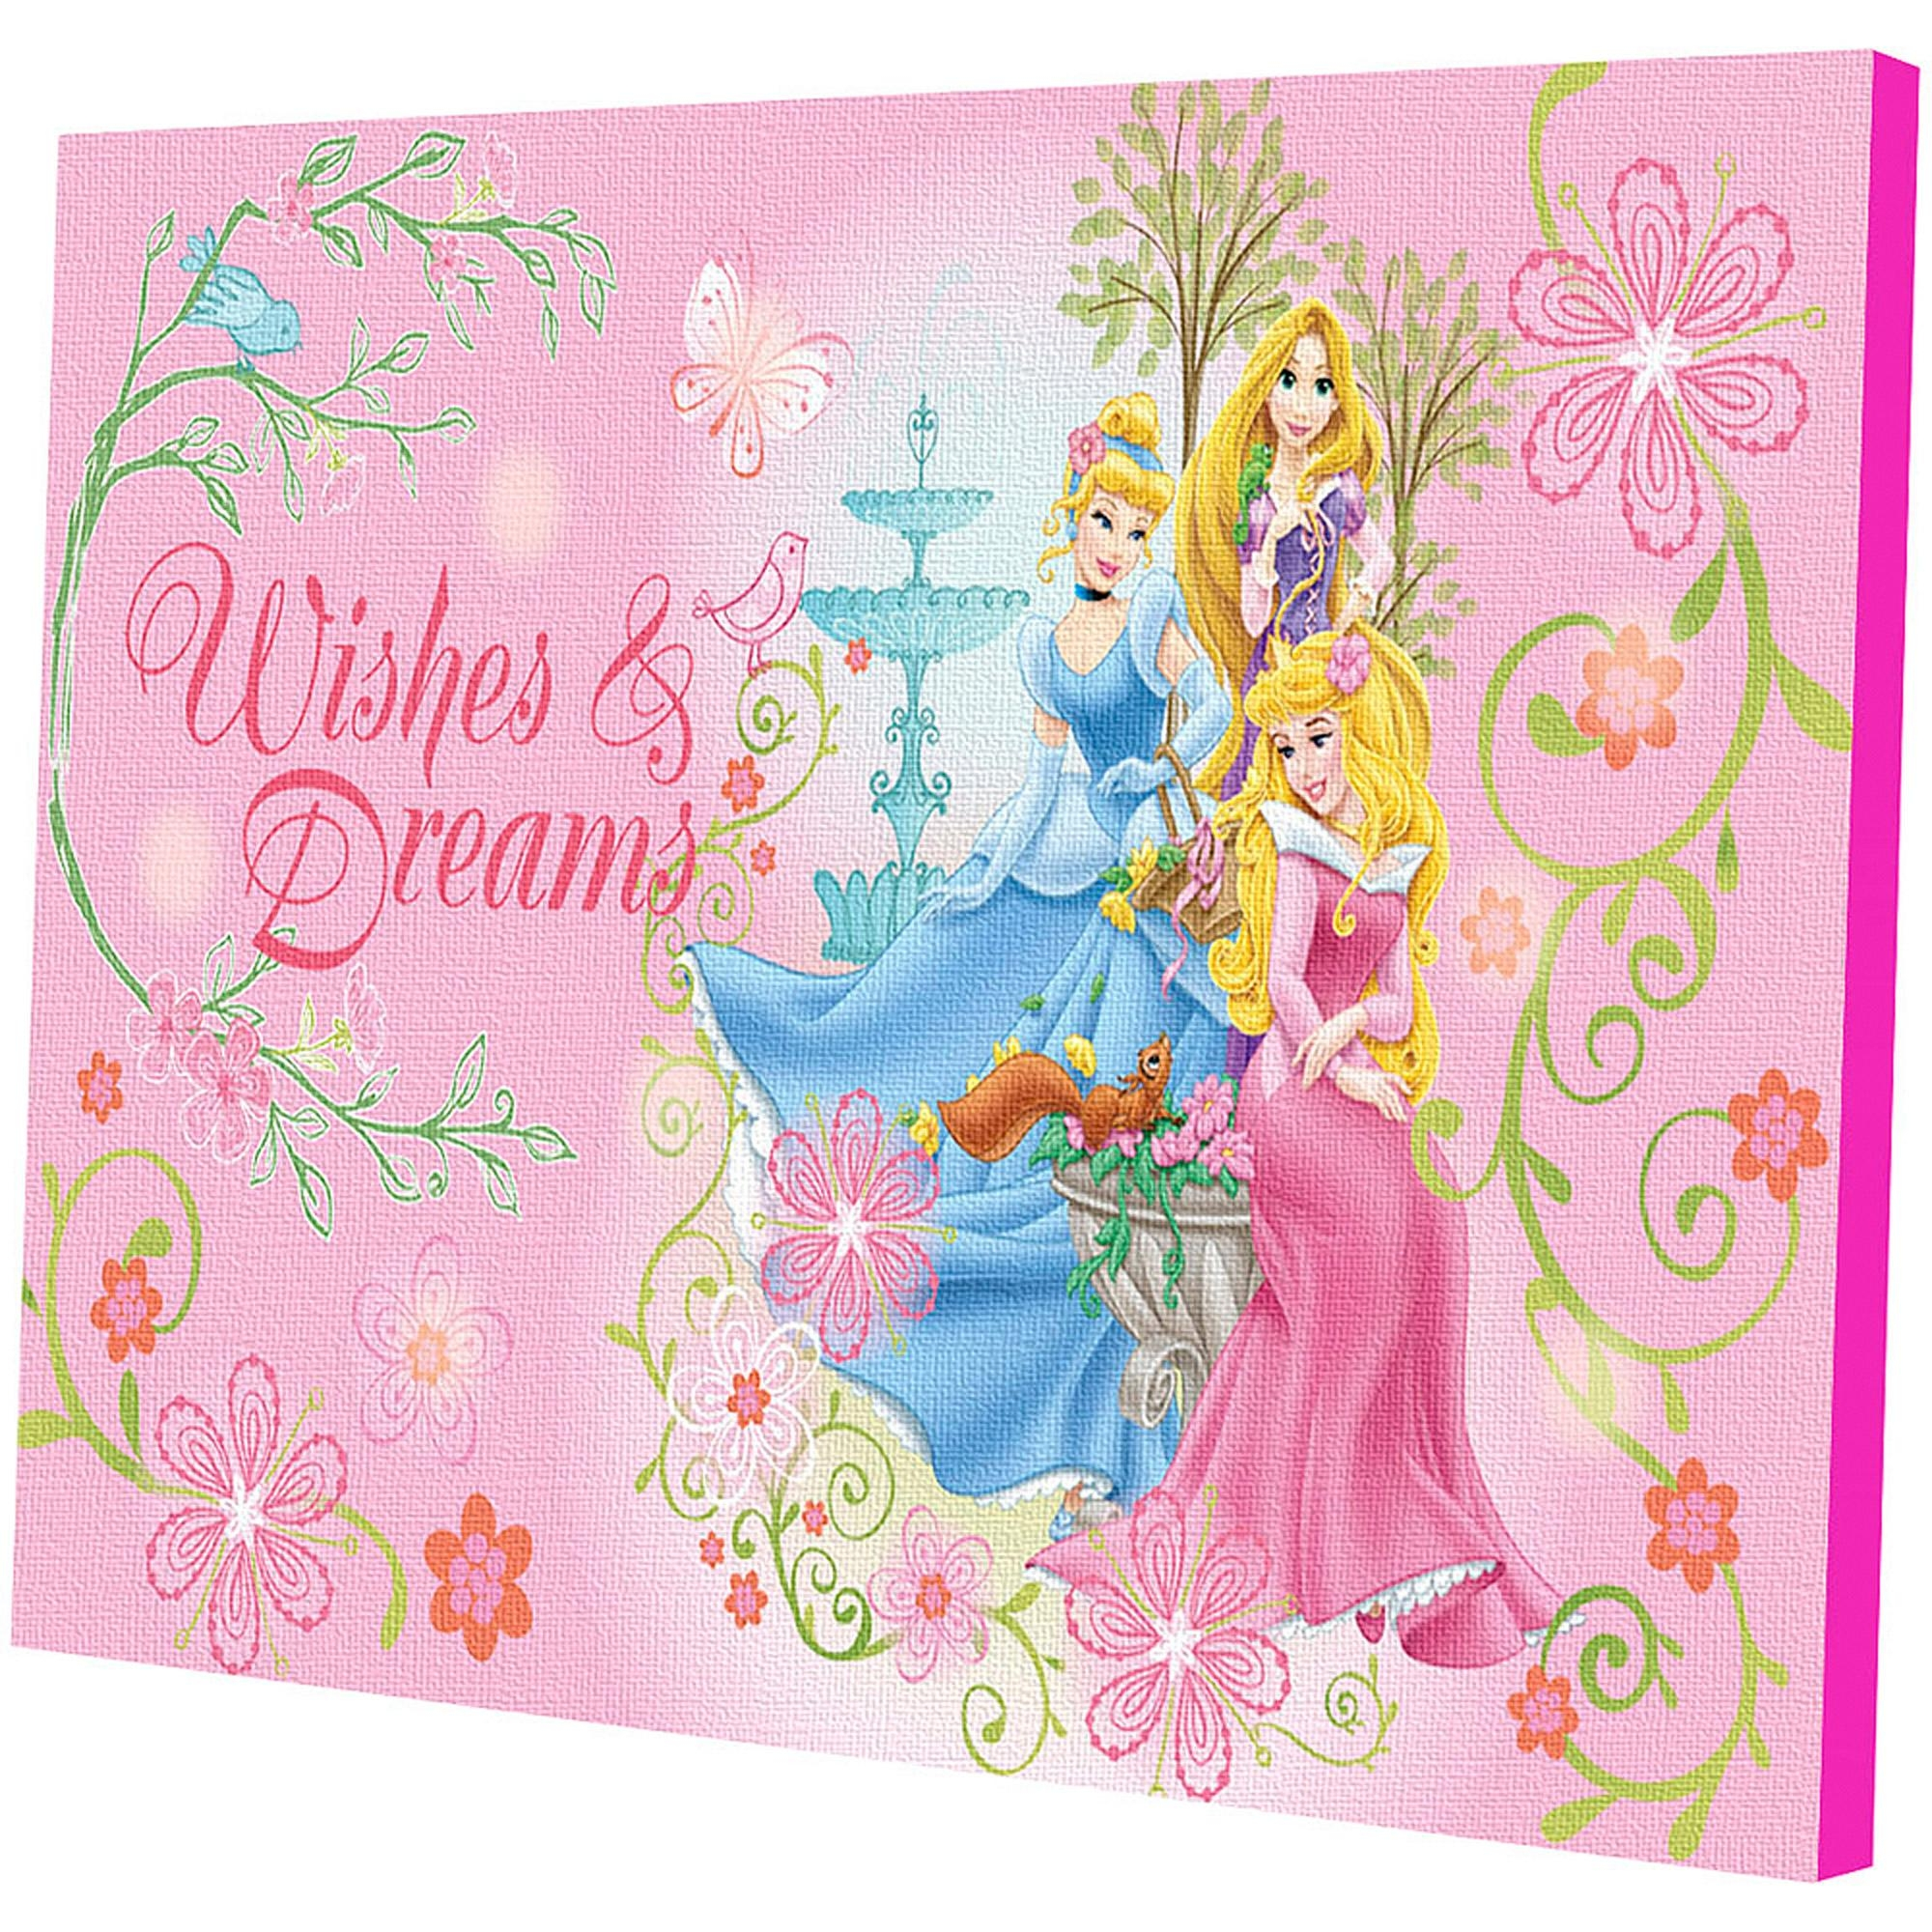 Disney Princess Led Light Up Canvas Wall Art – Walmart Intended For Princess Canvas Wall Art (View 2 of 20)